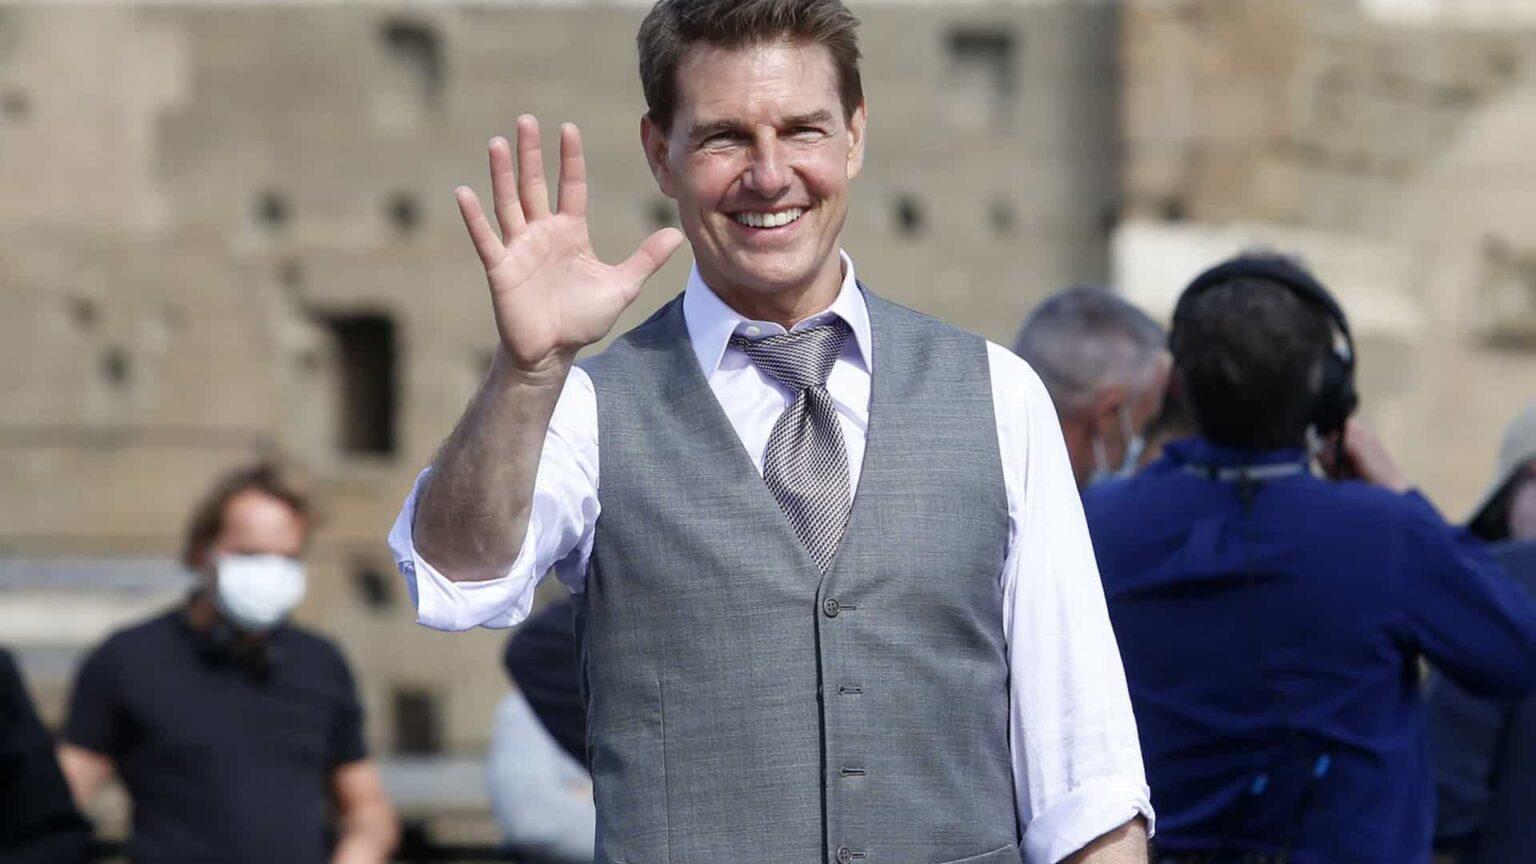 Flagra de Tom Cruise por paparazzi viraliza na web